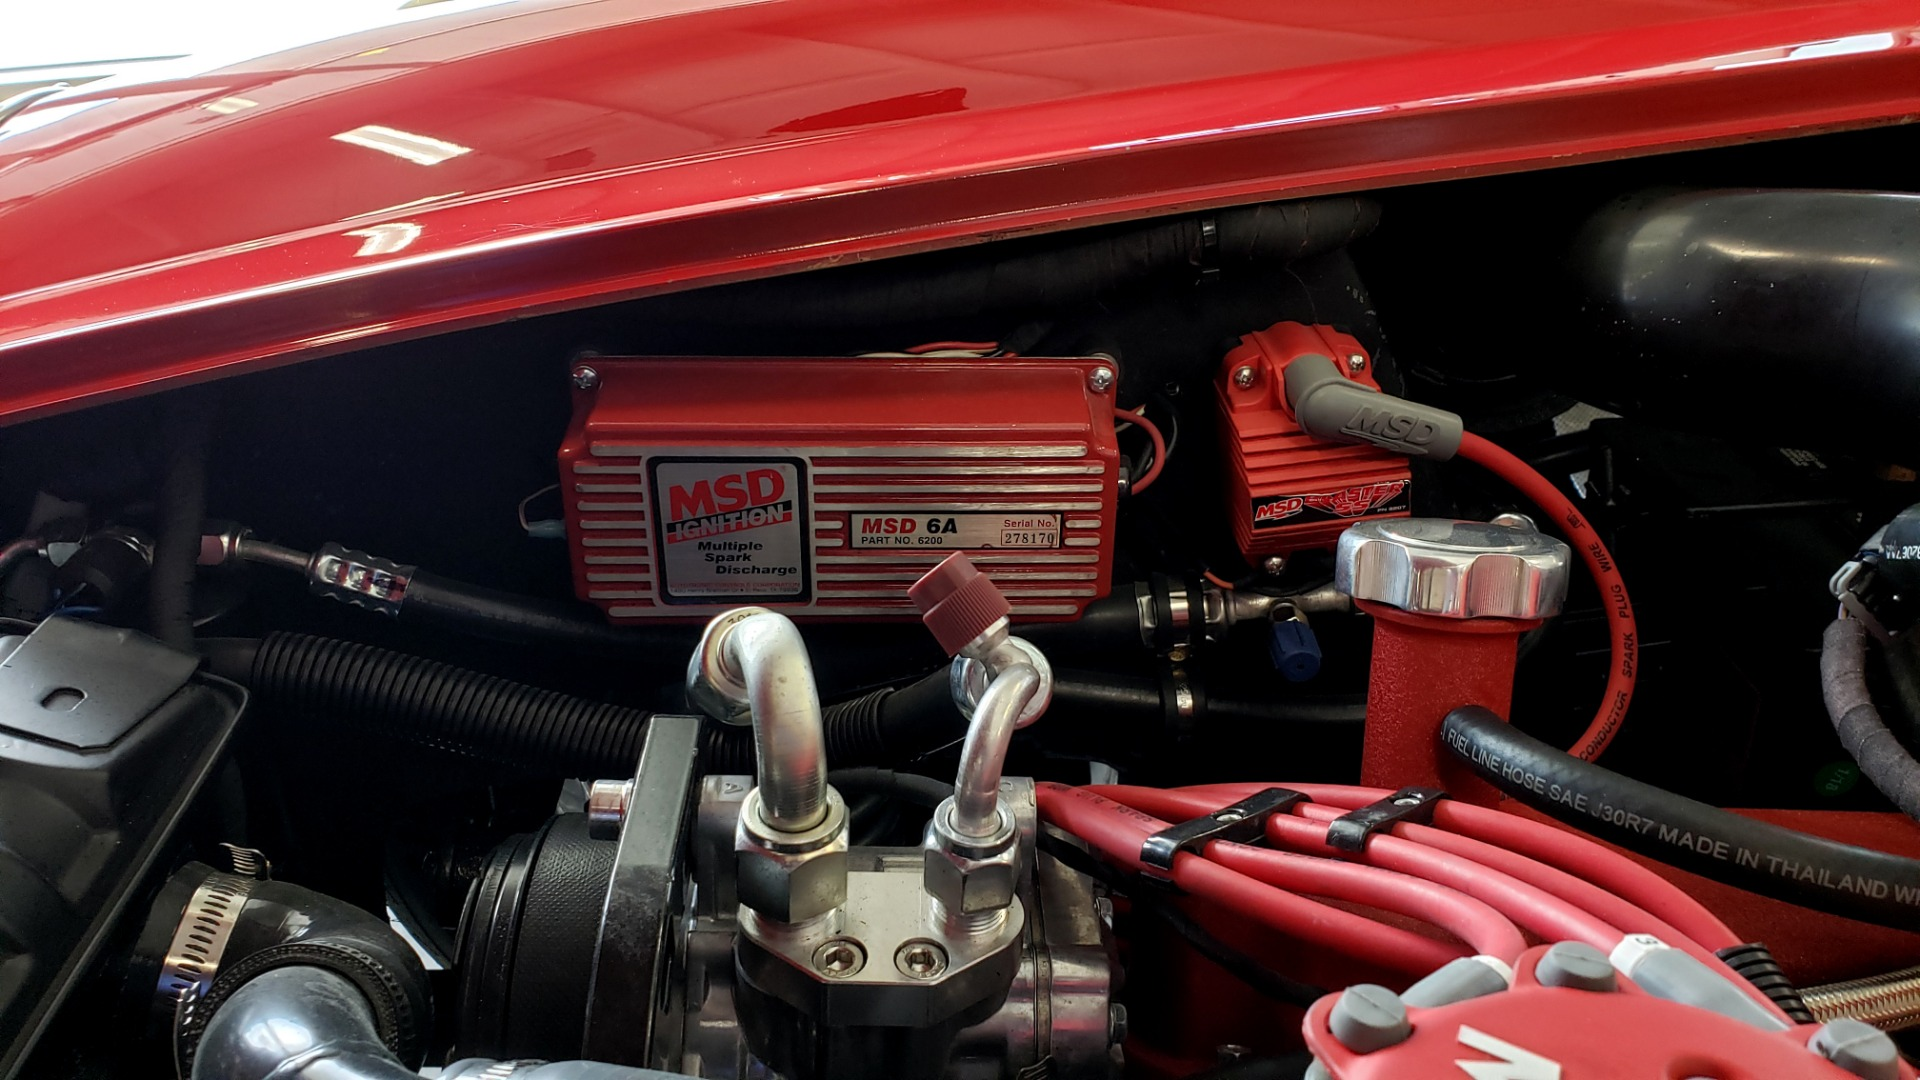 Used 1961 Ferrari 250GT SWB CALIFORNIA REPLICA / 302CI V8 / TREMEC 5-SPEED for sale Sold at Formula Imports in Charlotte NC 28227 74